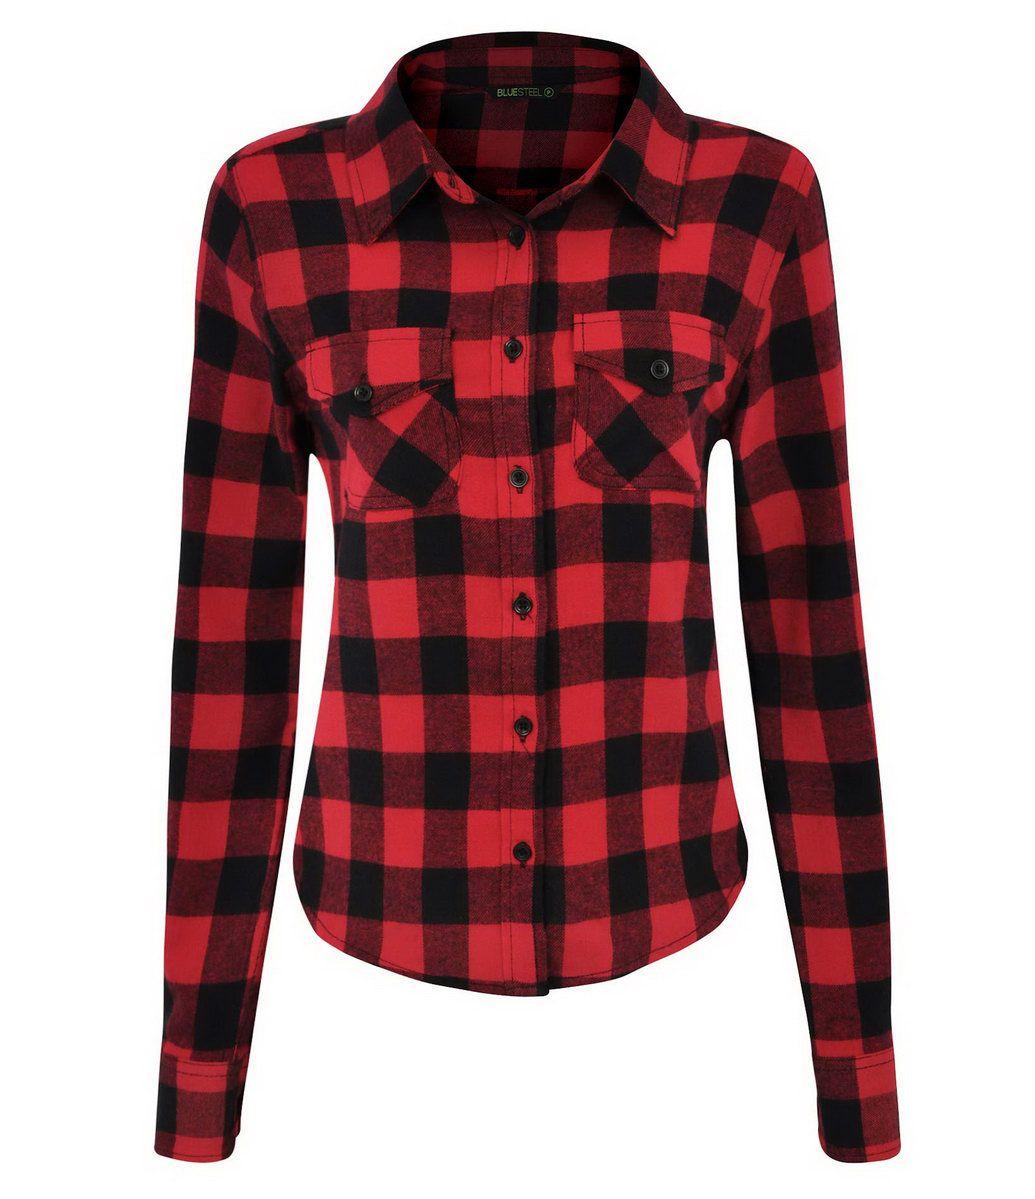 5d2d290f1 Camisa Feminina Xadrez em Flanela - Lojas Renner Mais